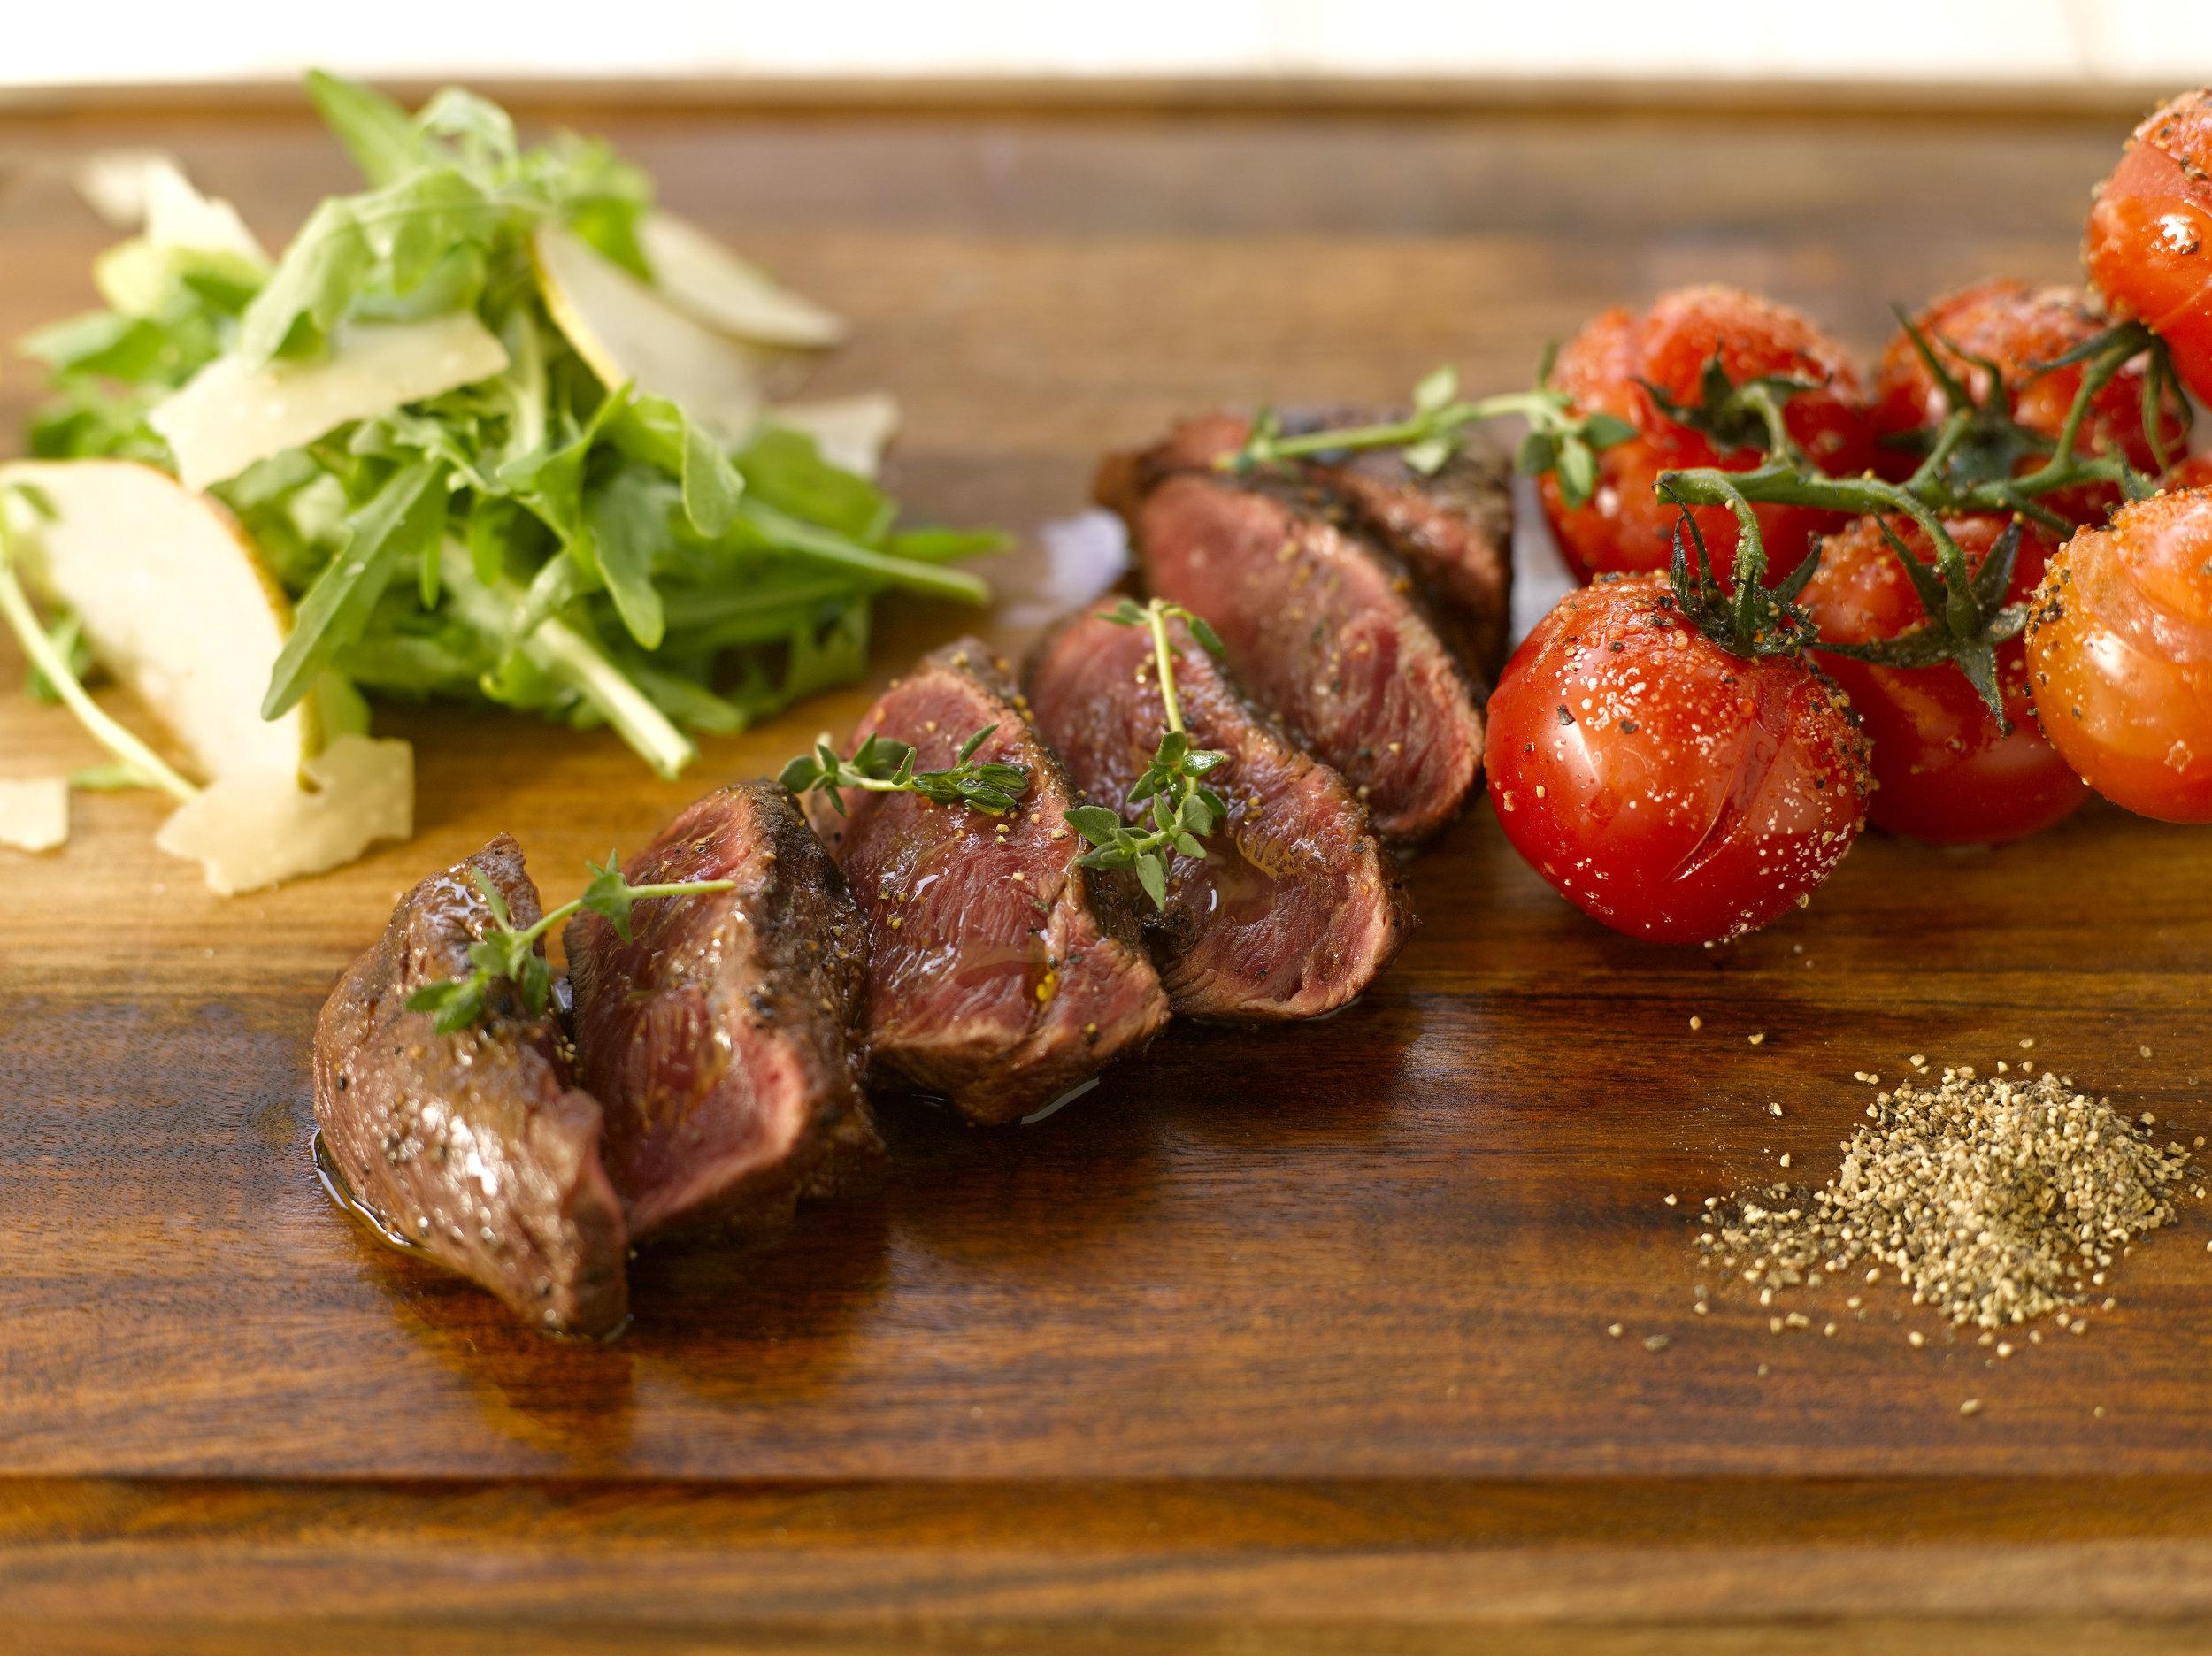 Grass-fed Flat Iron Steak | Photo Credit: Grand Hyatt Singapore